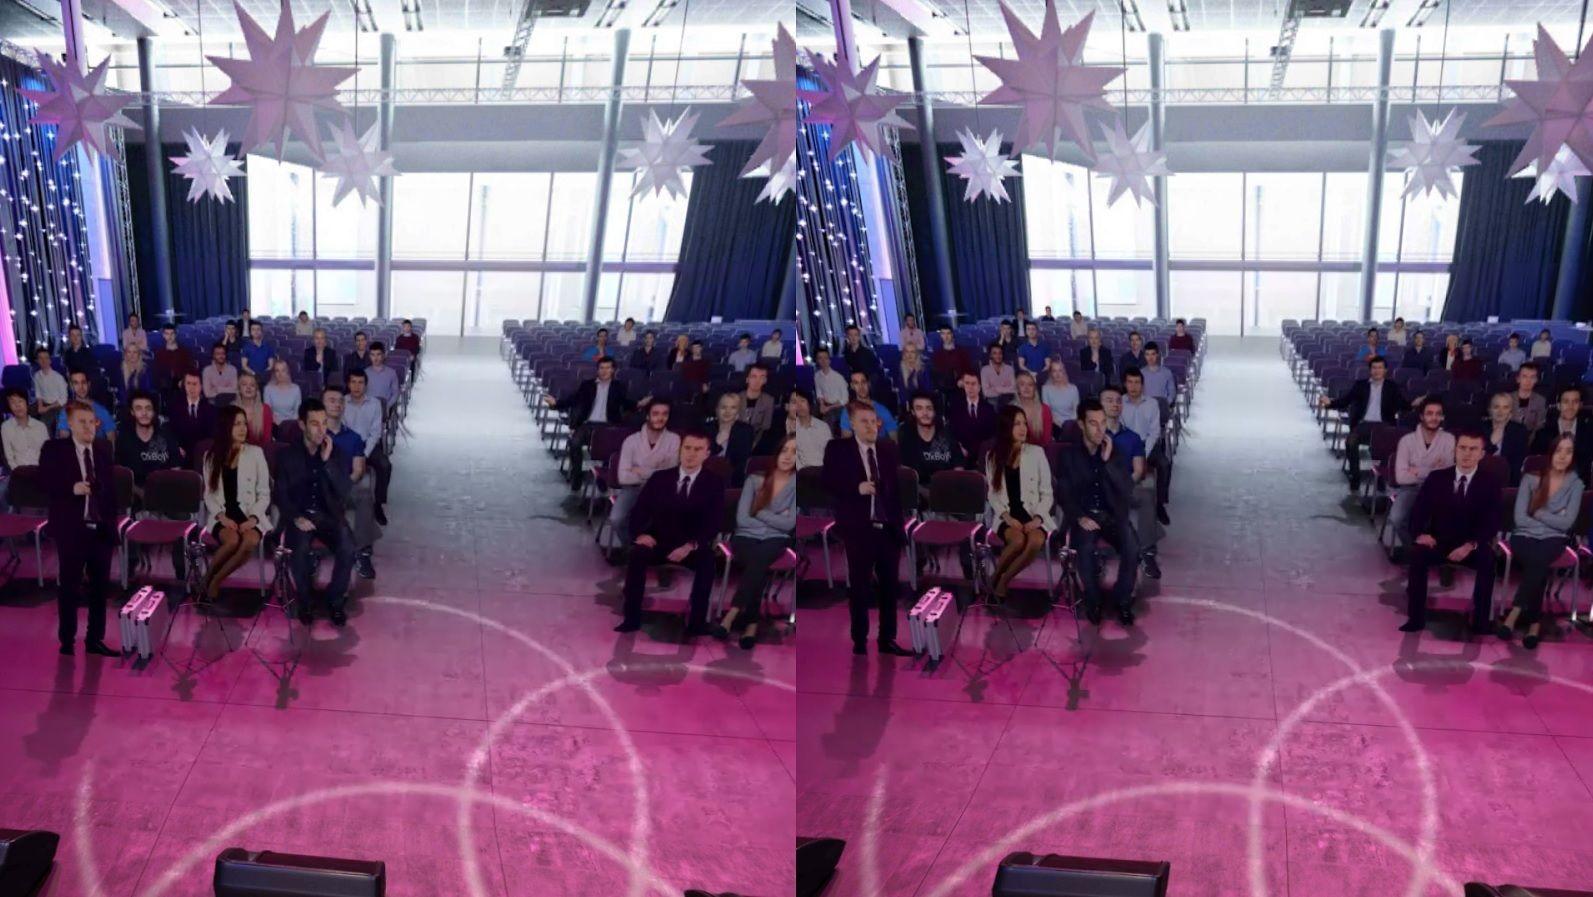 Virtual reality public speaking VR Google Cardboard